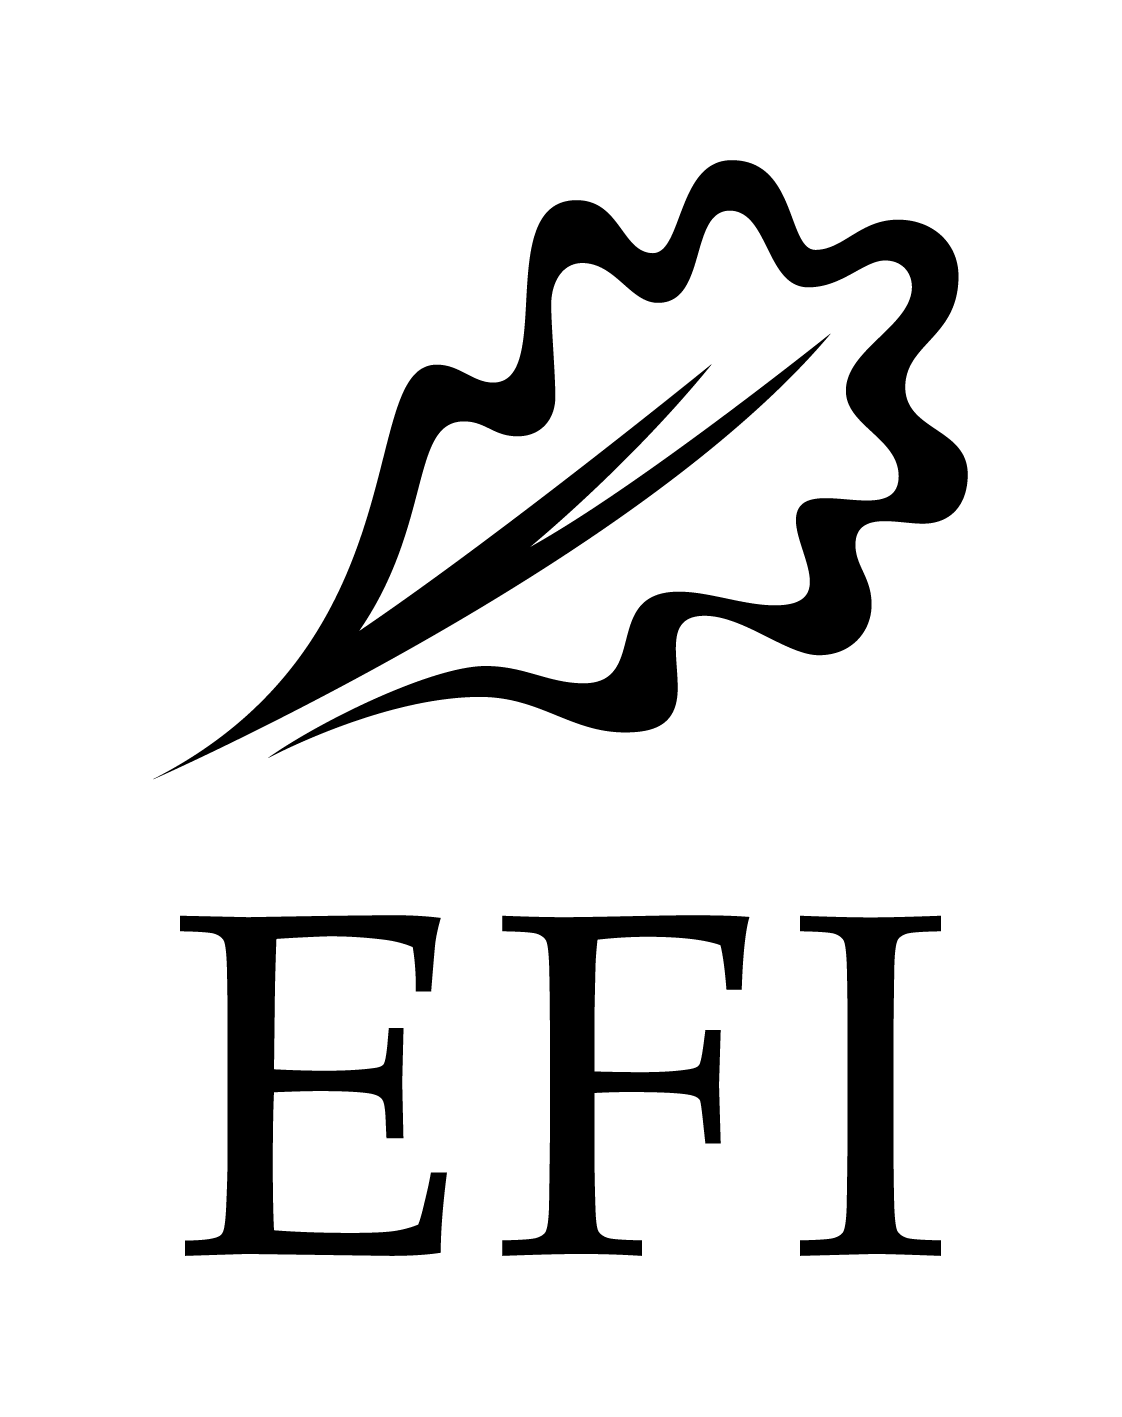 logo for European Forest Institute